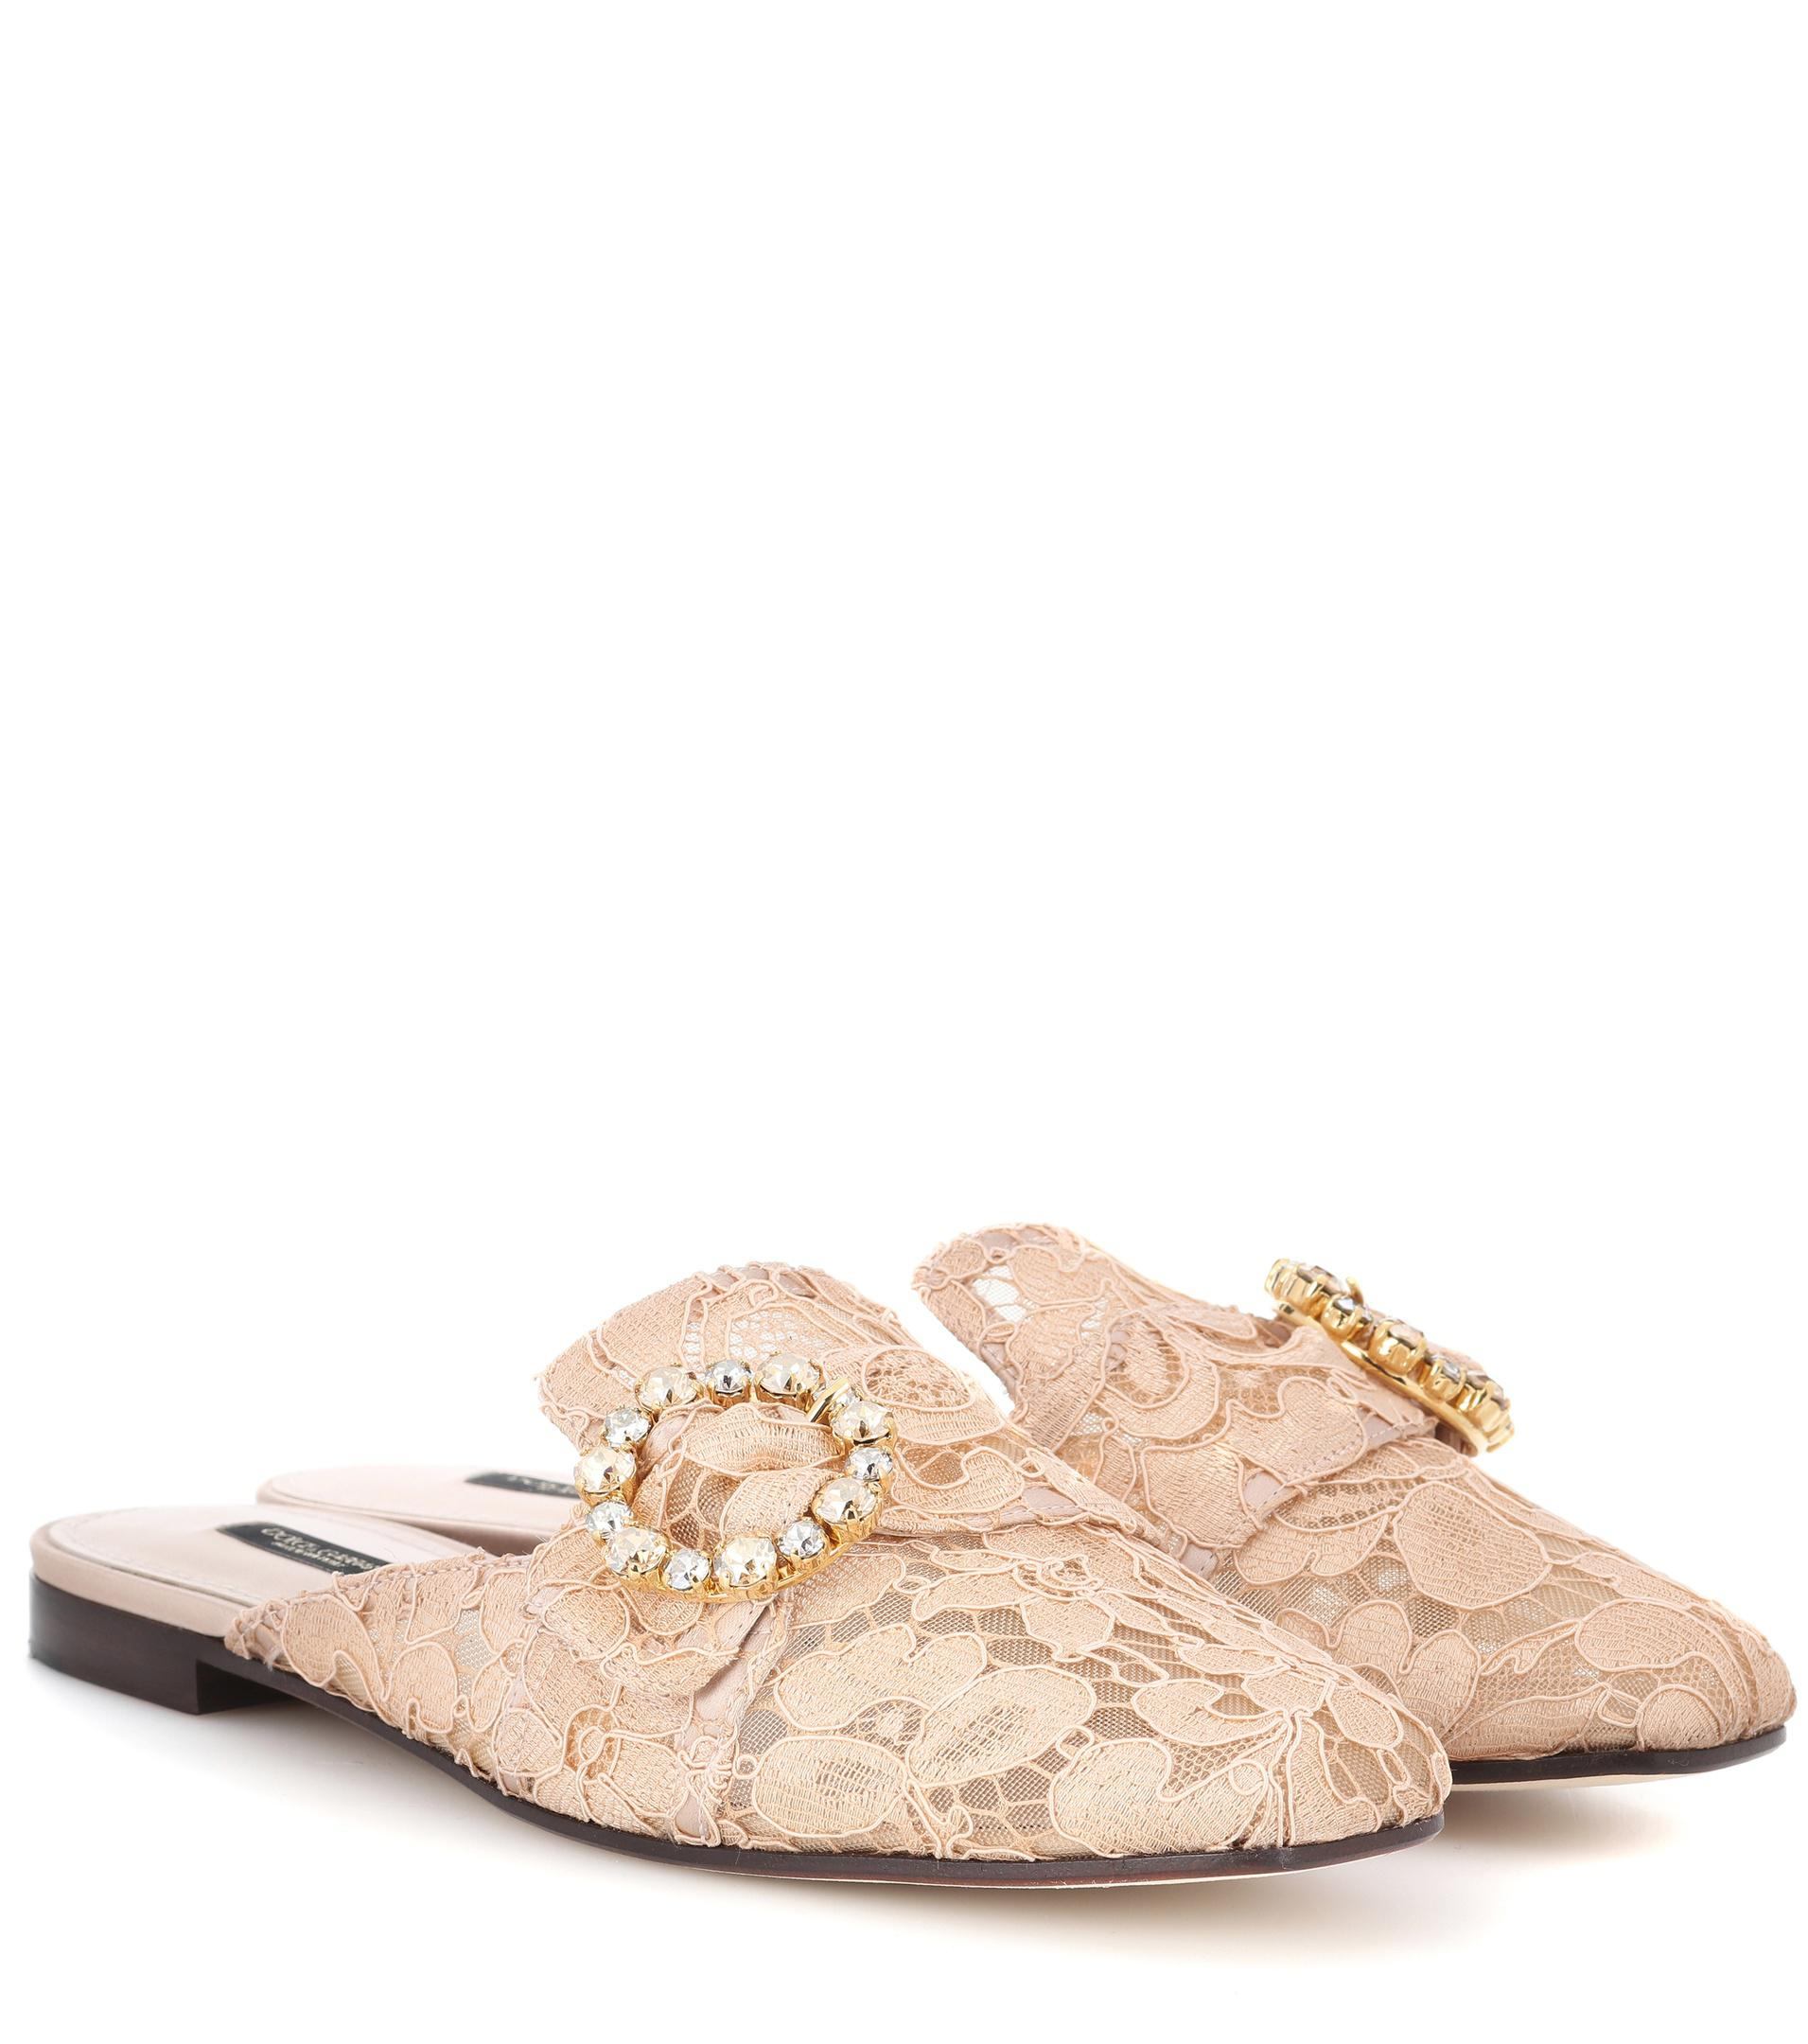 Dolce & Gabbana Jackie embellished slippers 100% guaranteed for sale eABWKFVl8K